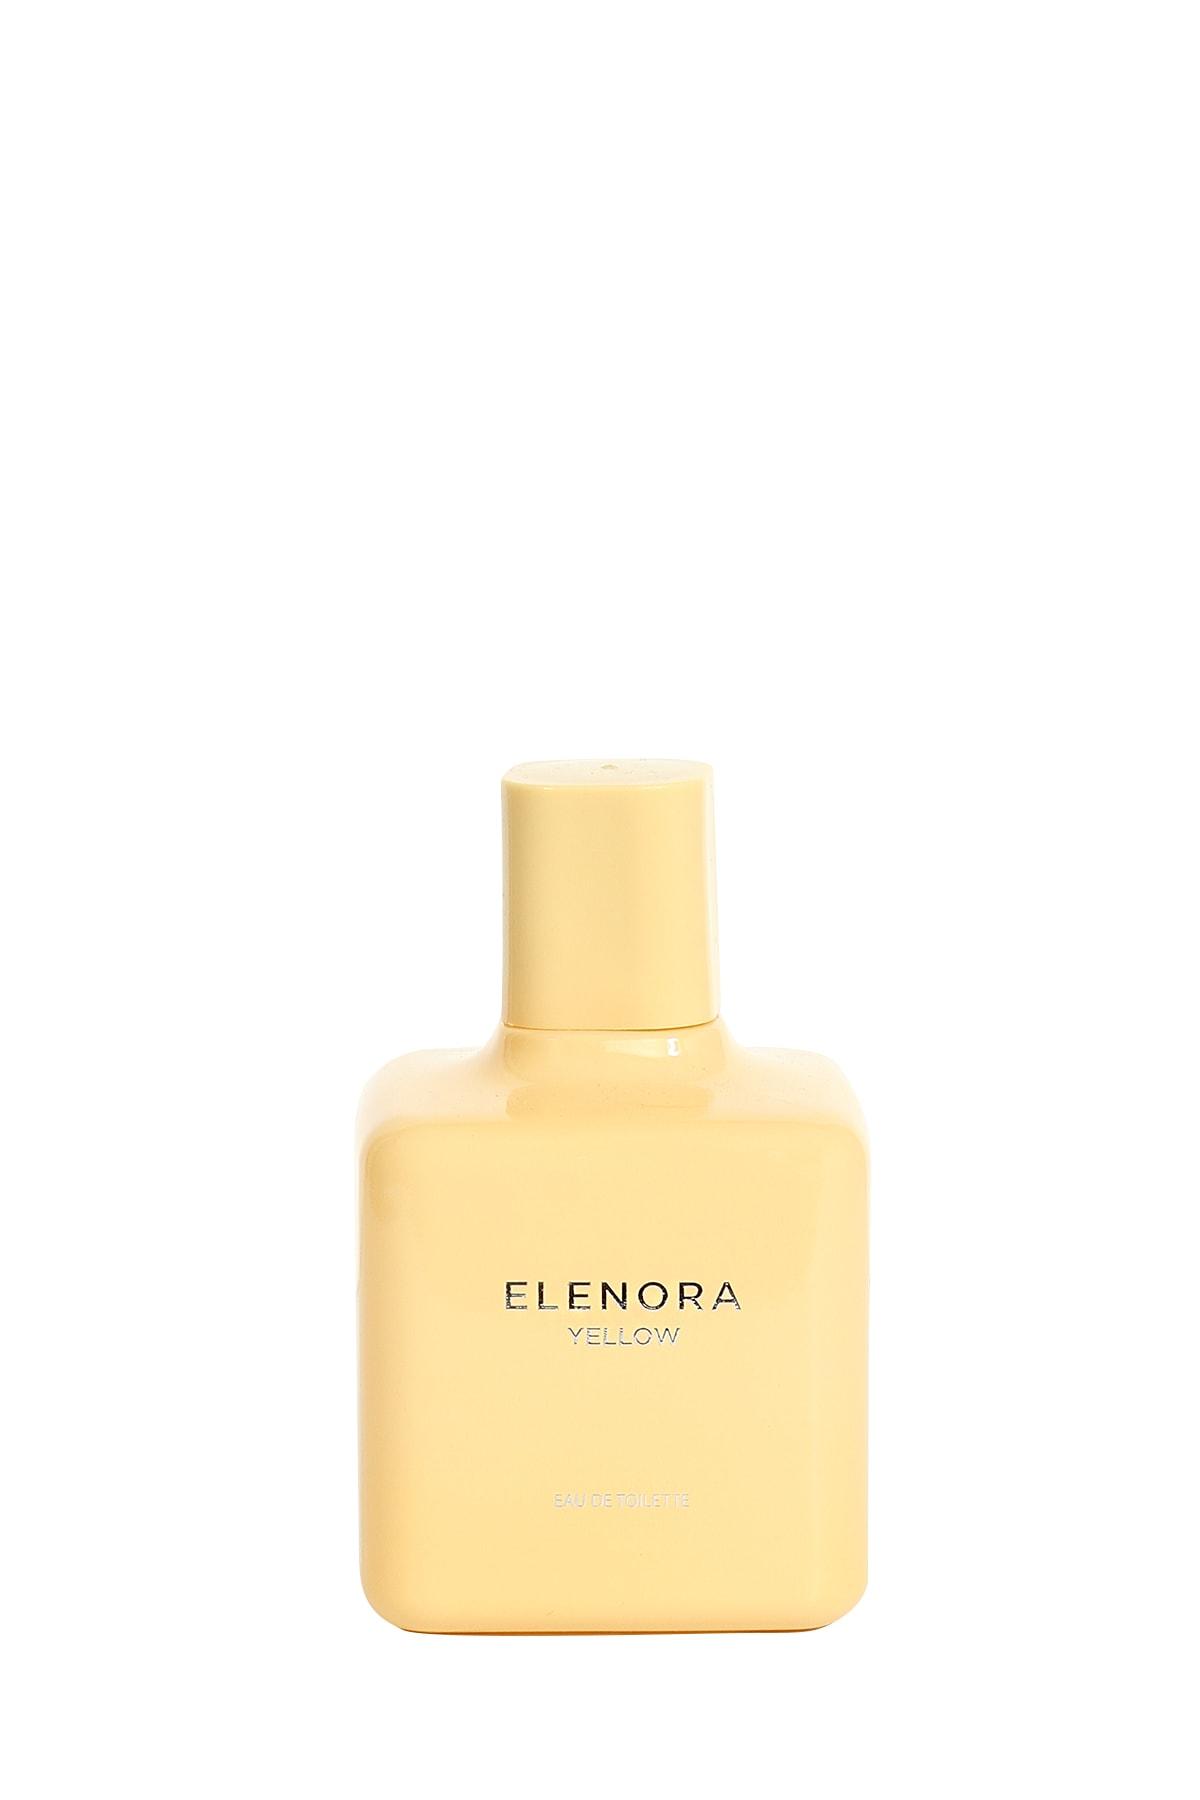 Collezione Kadın Sarı Parfüm Elenora UCB280269A39 1